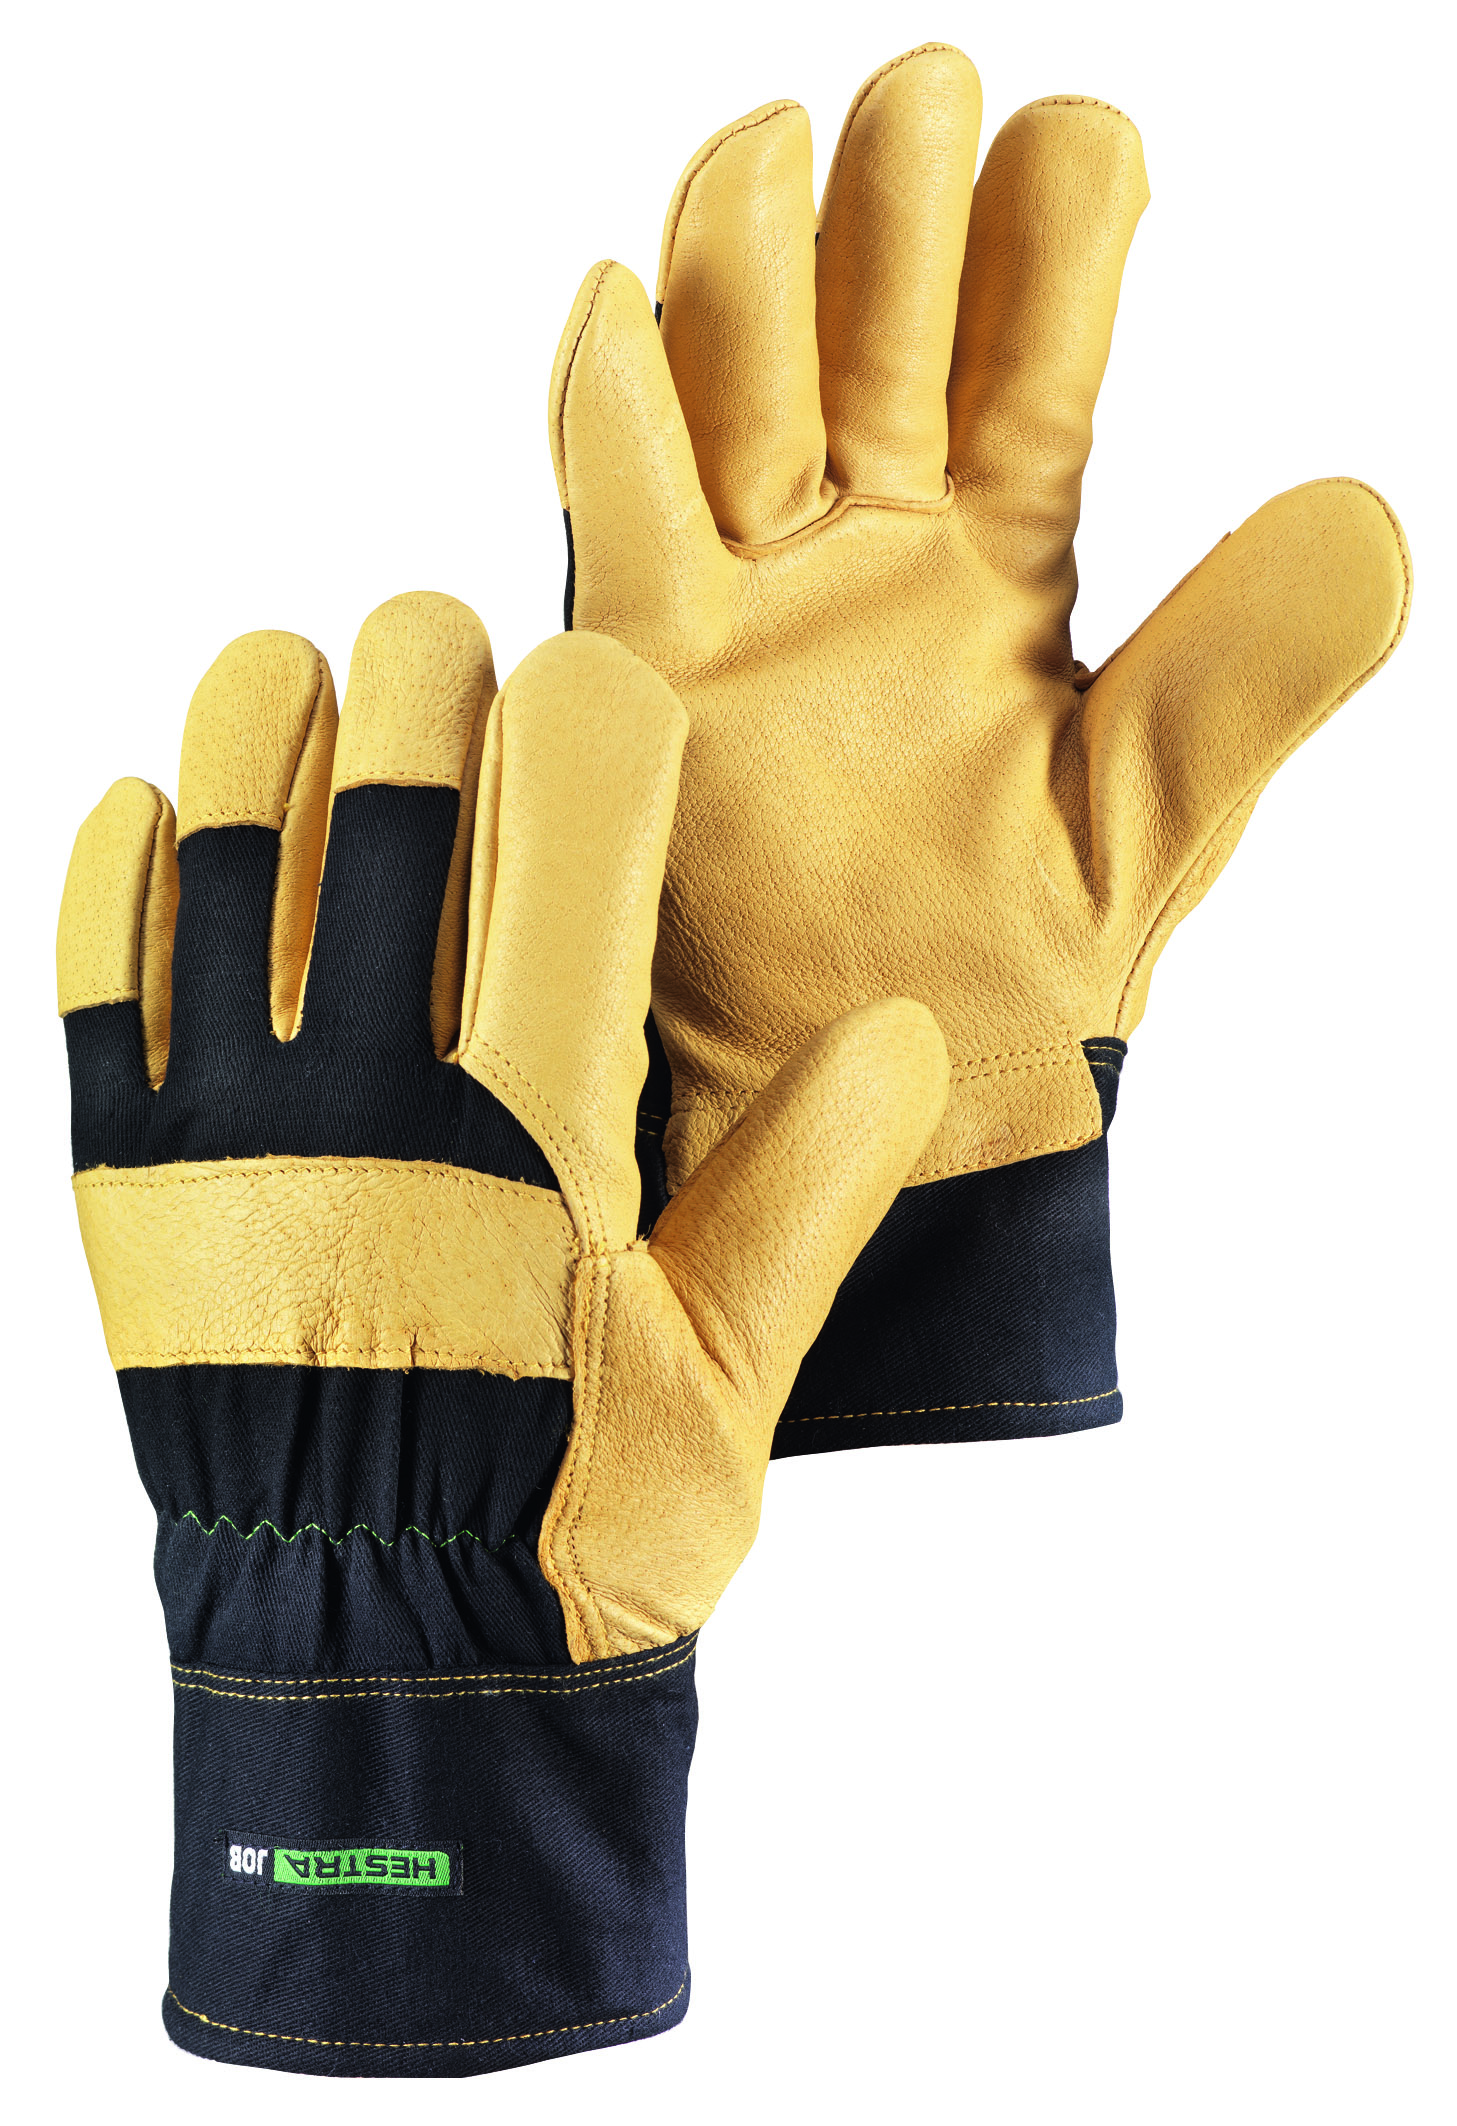 Leather work gloves ebay - Image Is Loading Tantel Insulated Pigskin Leather Work Gloves Tan Black